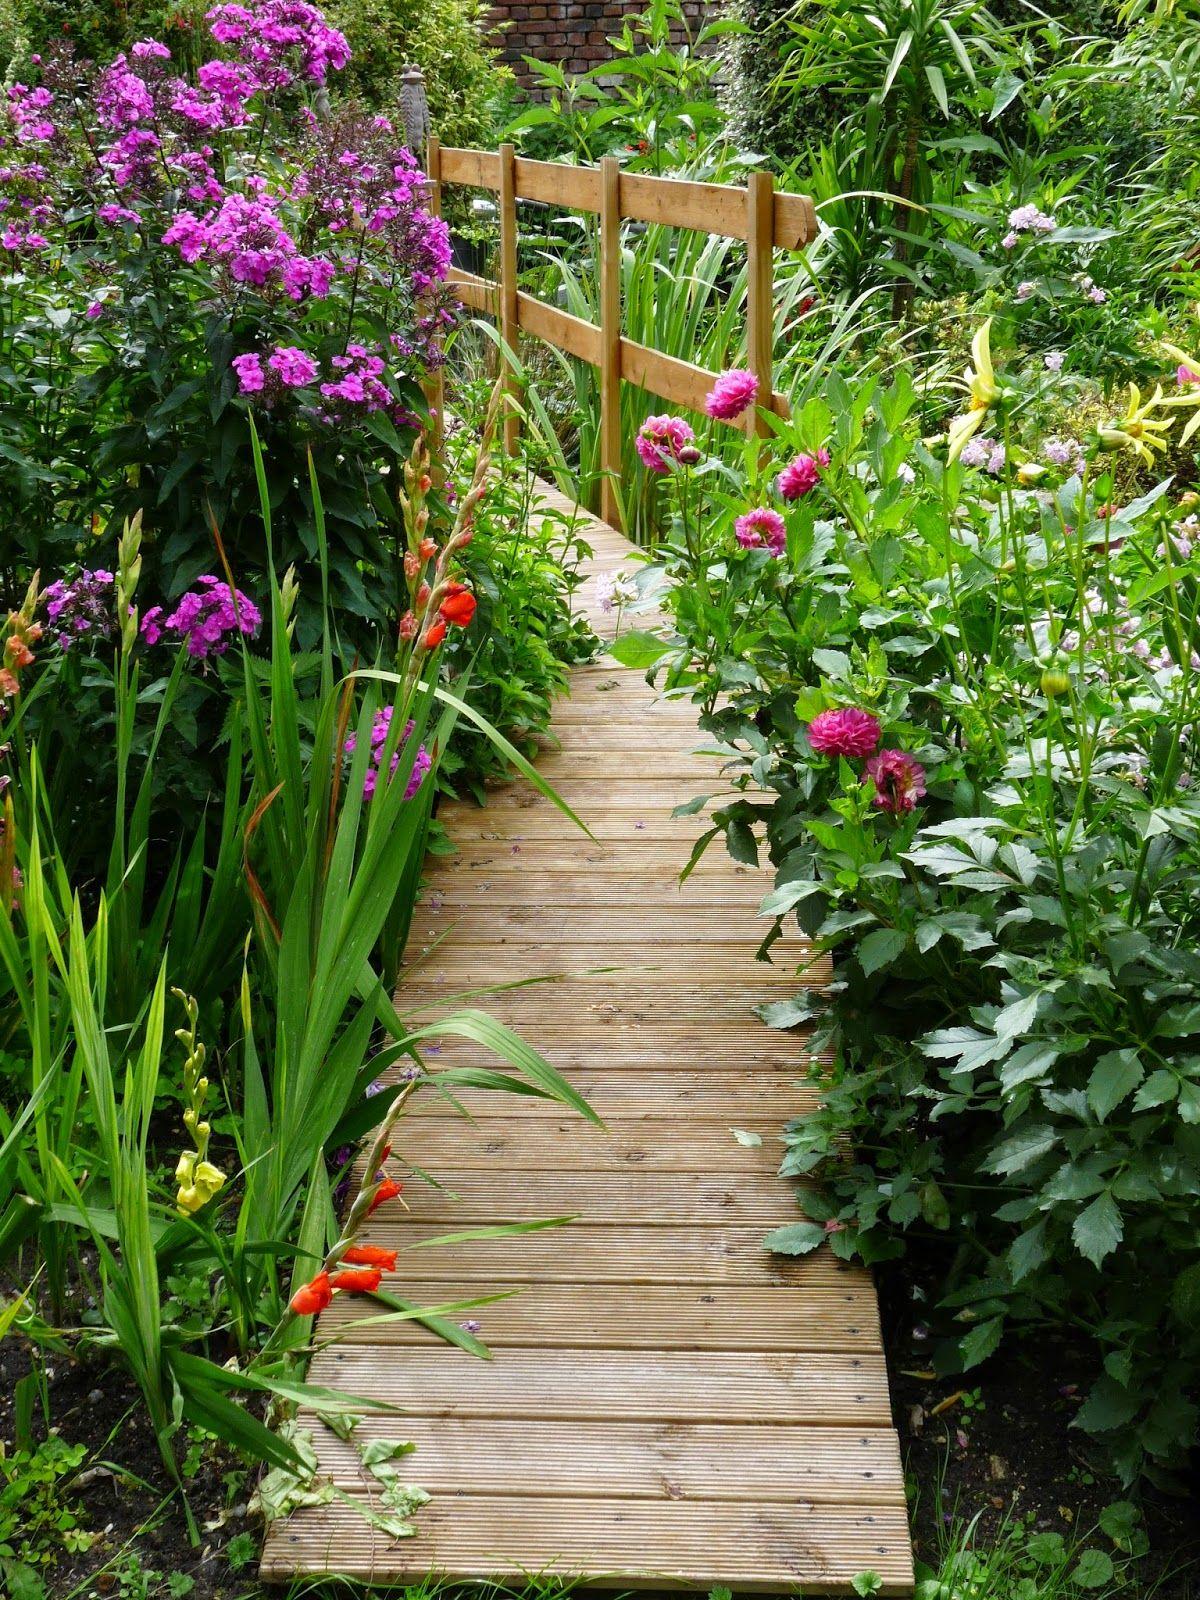 Diy Pont En Bois Pour Bassin Jardin Botanique Idees Jardin